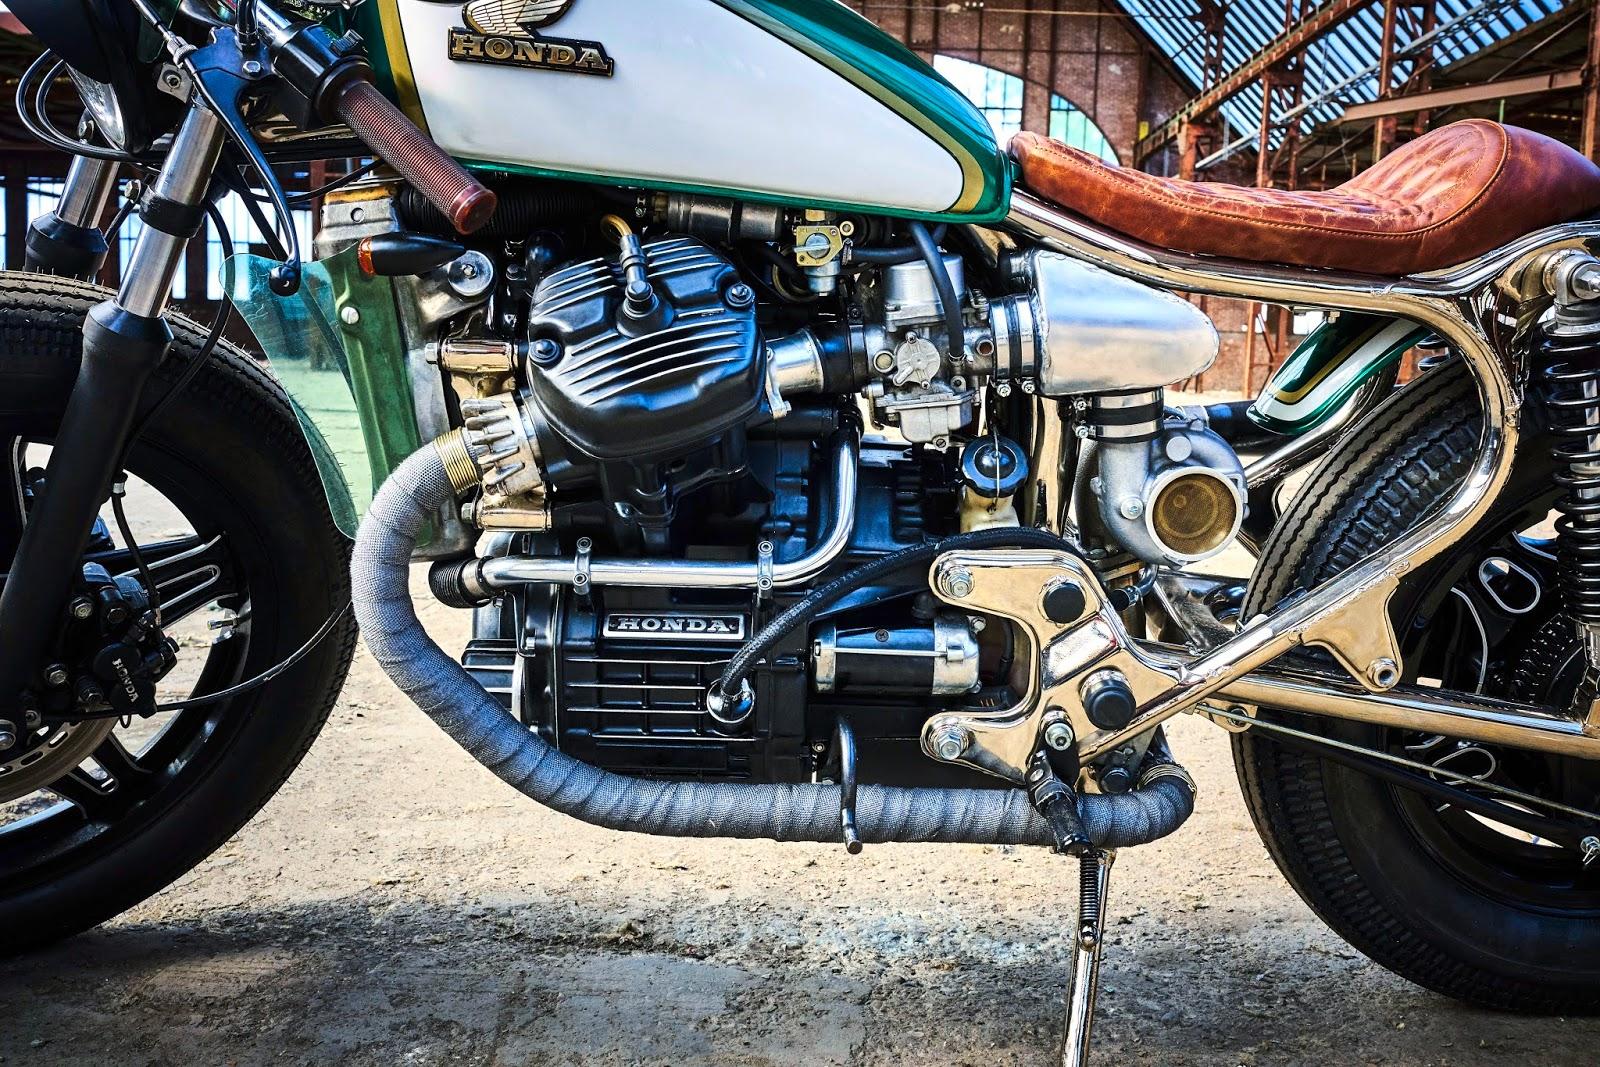 Honda Cx500 Turbo Cafe Racer